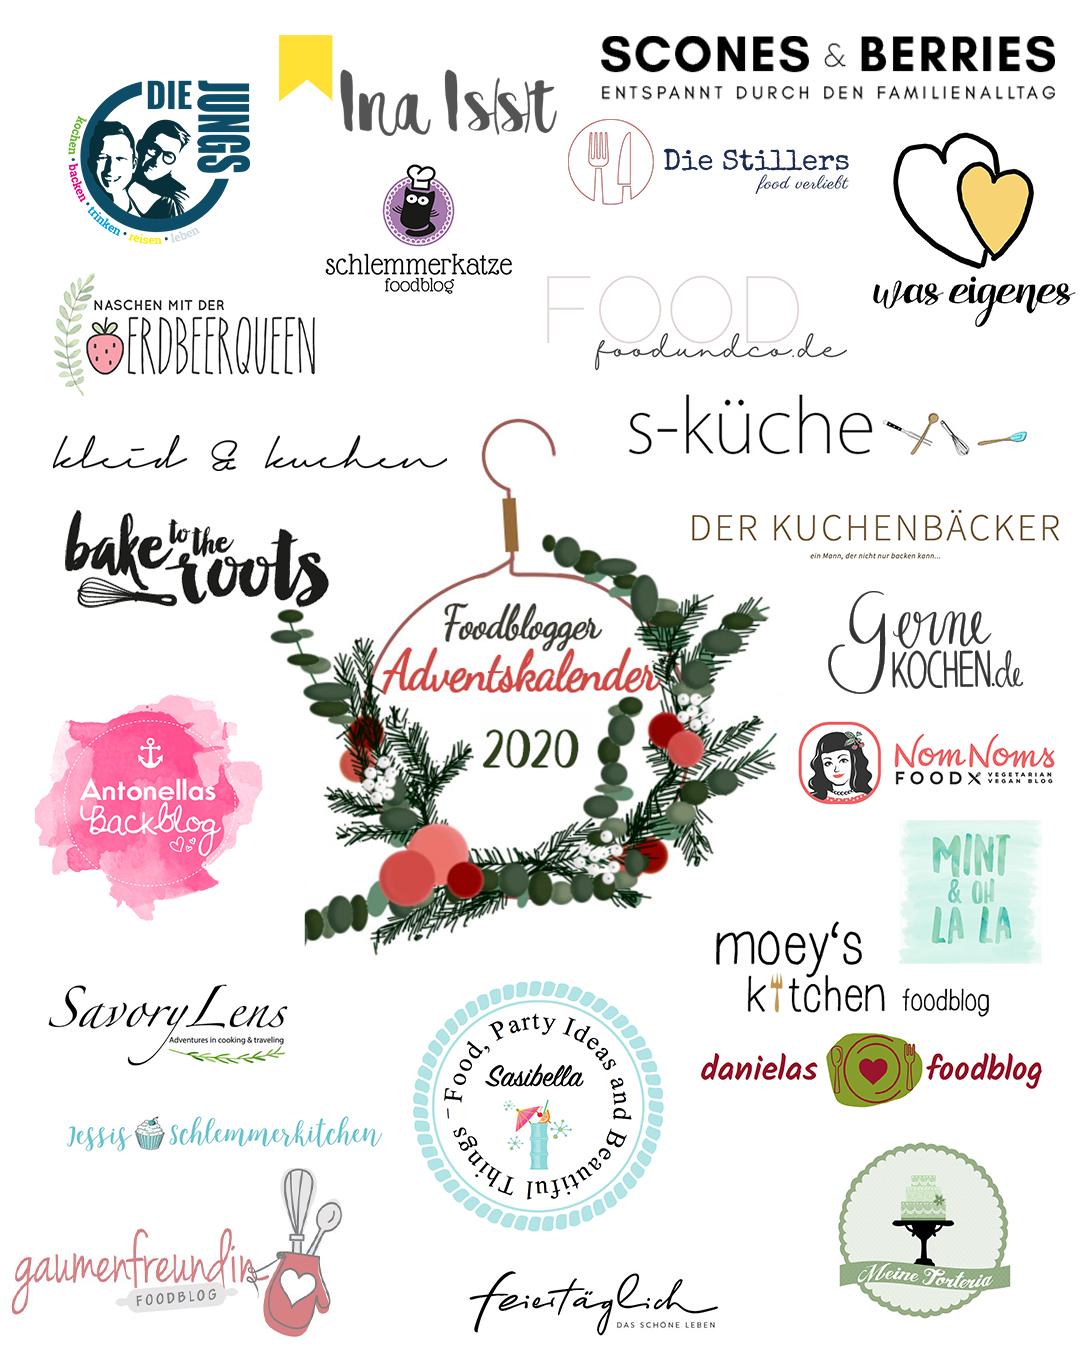 Foodblogger Adventskalender 2020